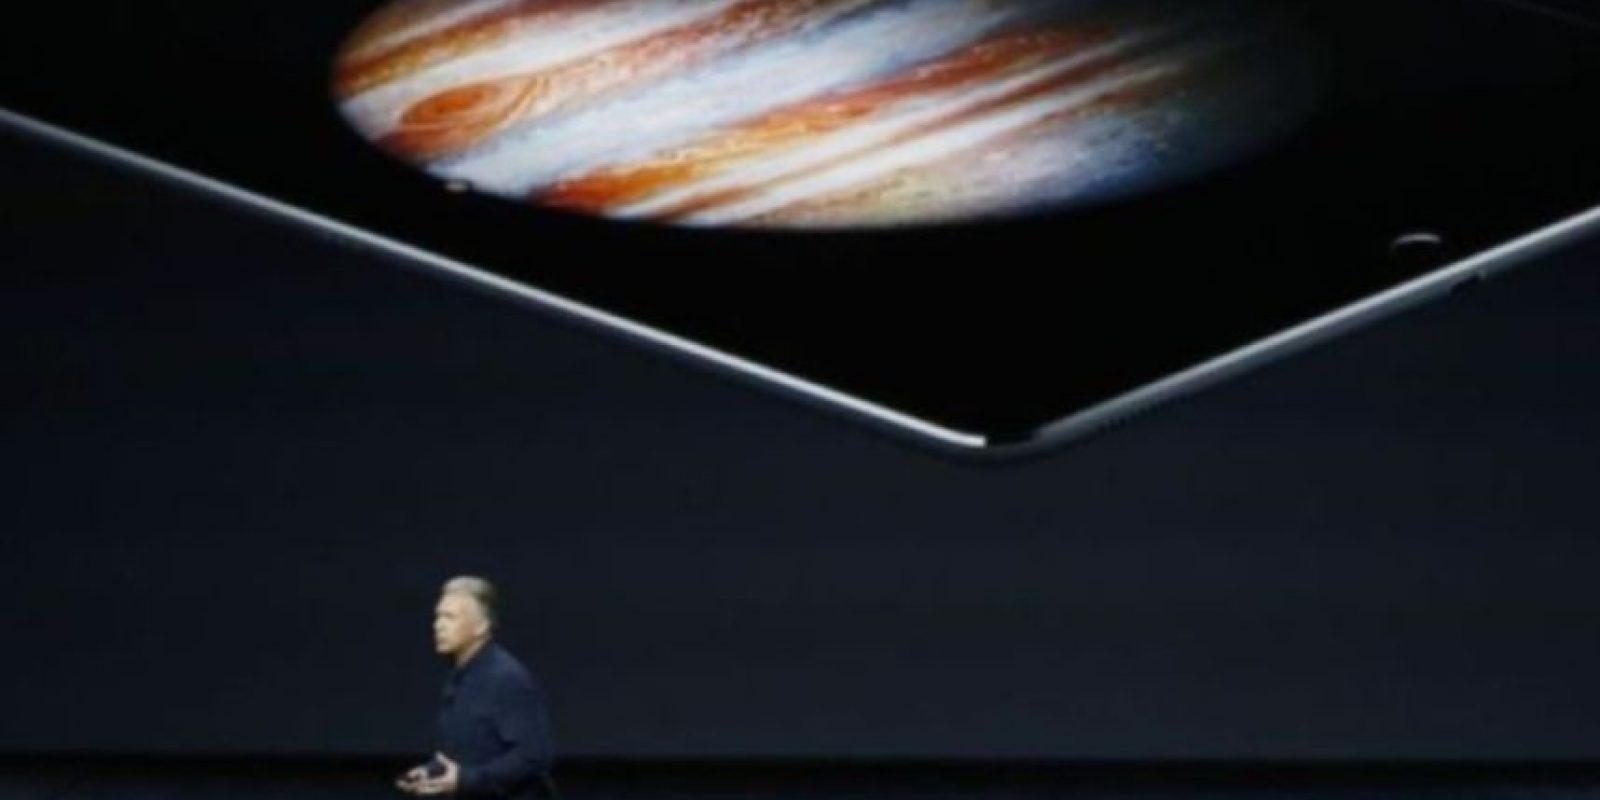 713 gramos (1.57 libras) pesa el modelo Wi-Fi. Foto:Apple